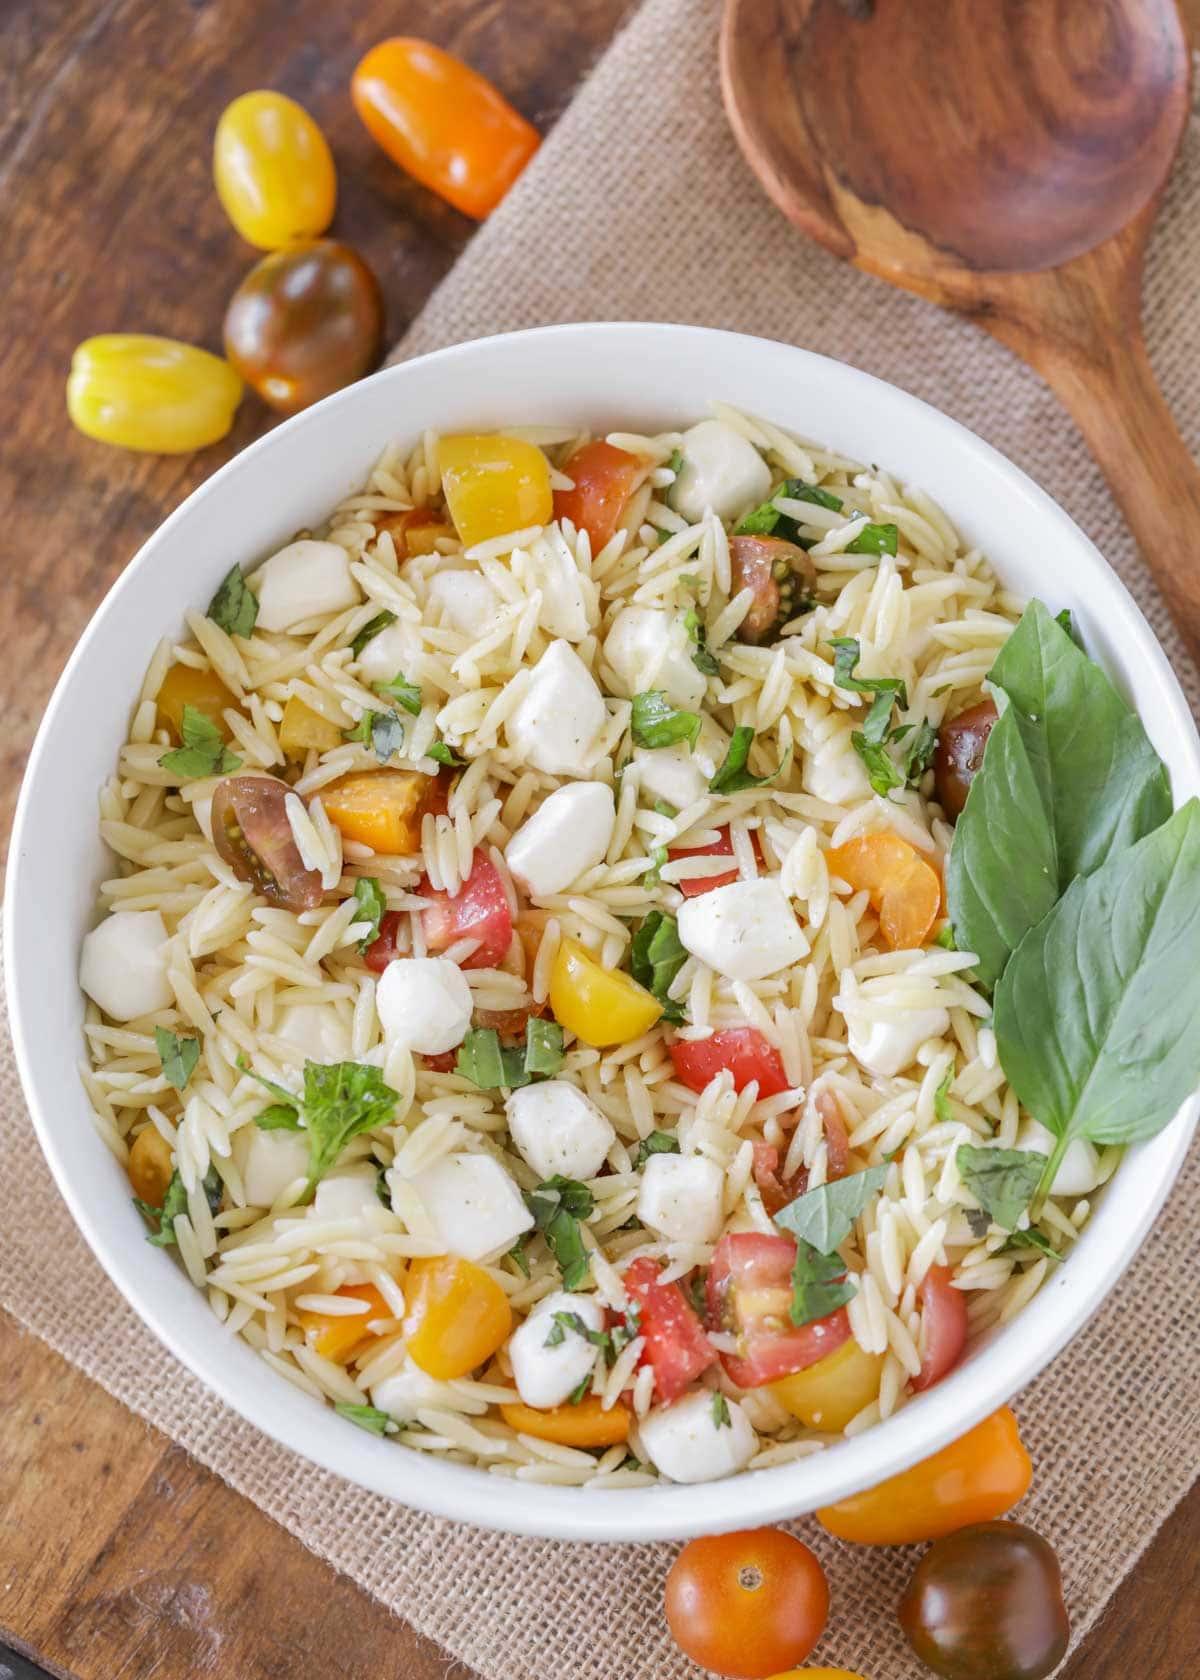 Fresh mozzarella pasta salad in a white bowl